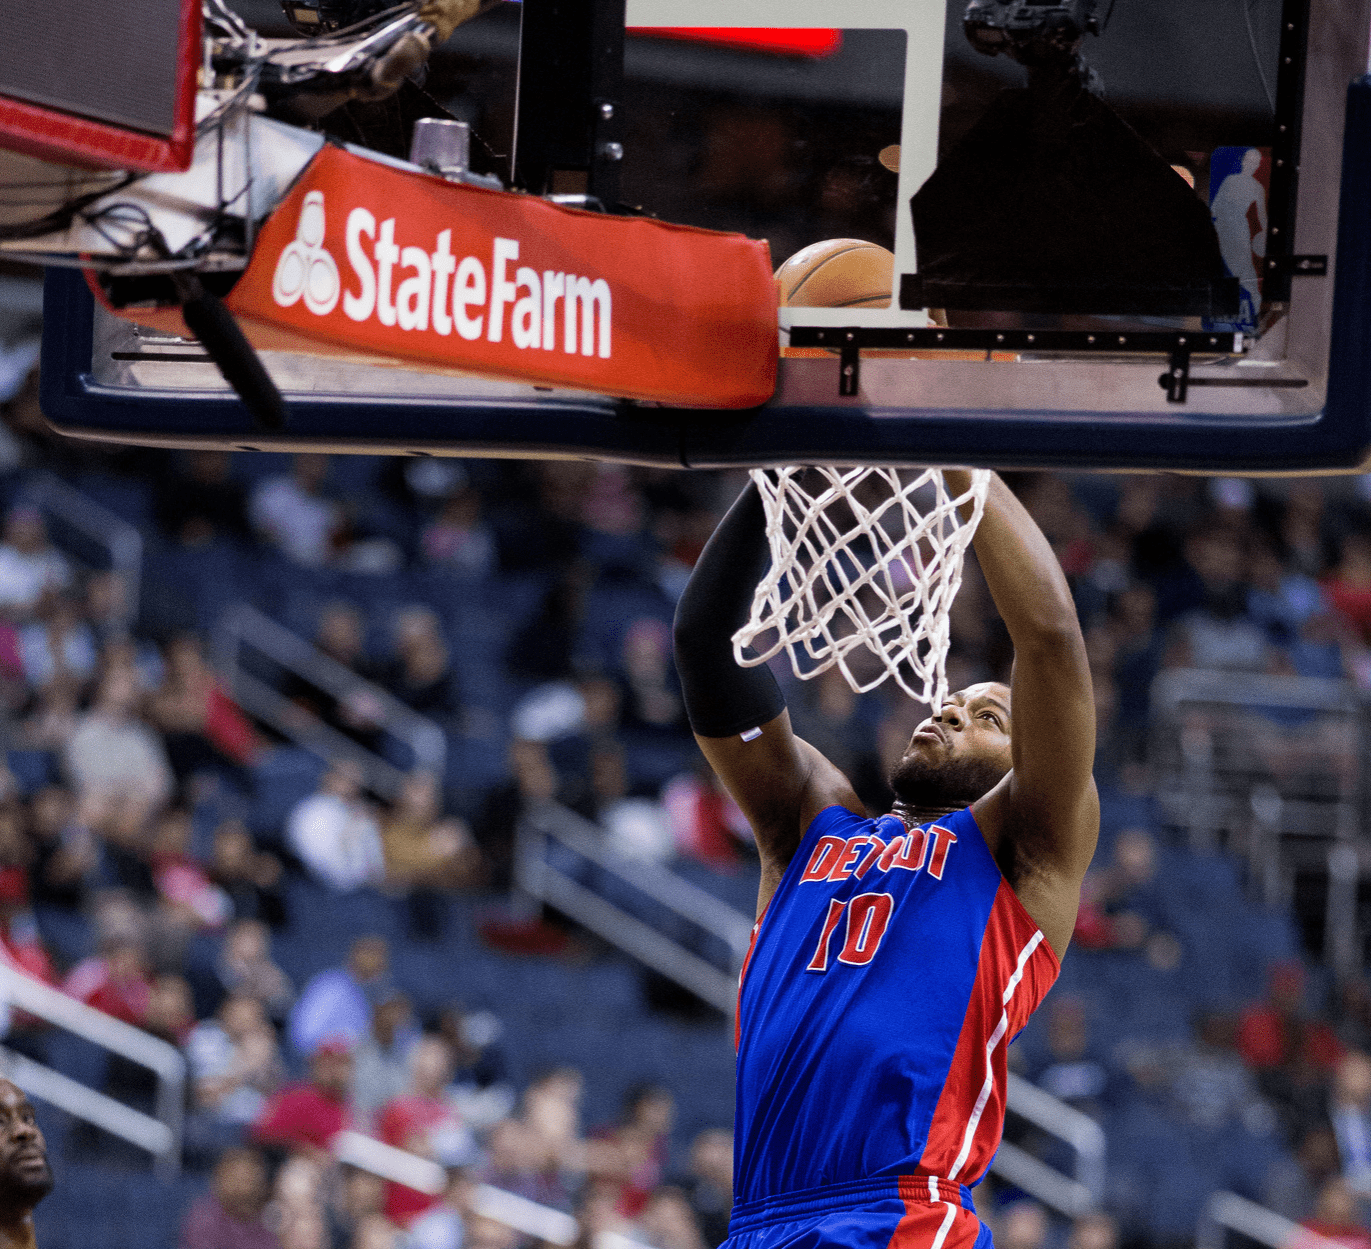 Nba Finals Game 6 Venue 2015 | All Basketball Scores Info